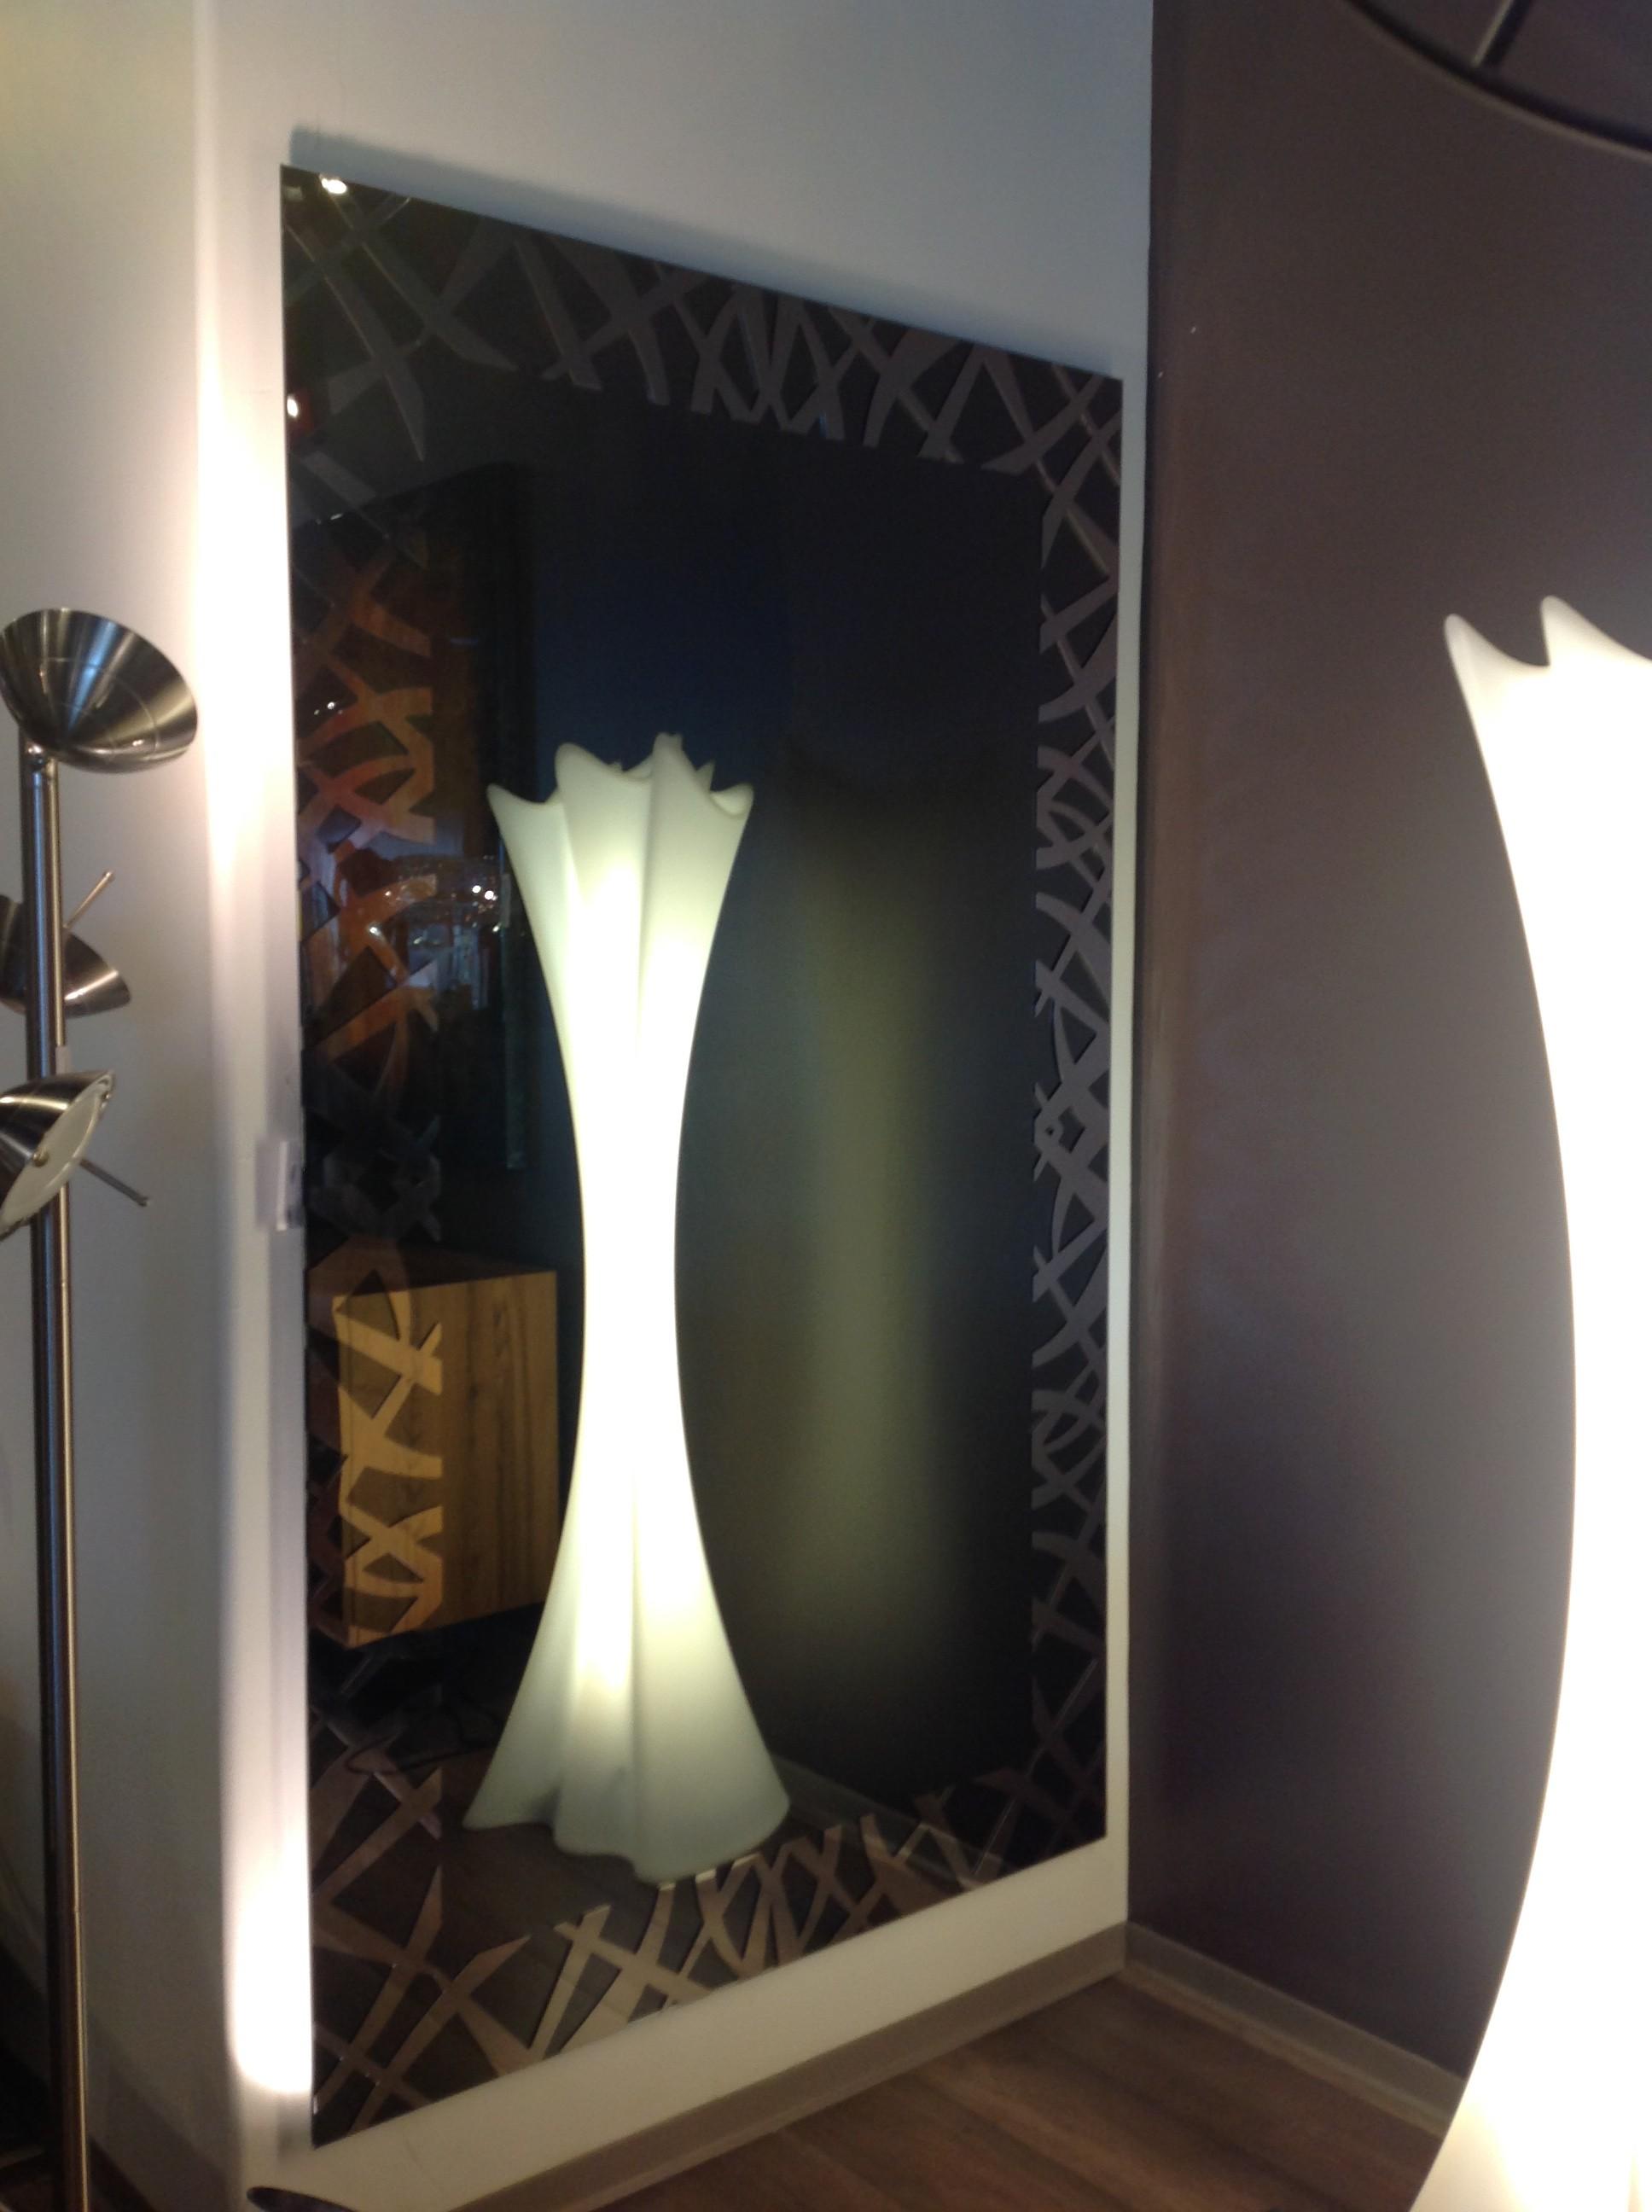 Catteran Mirror